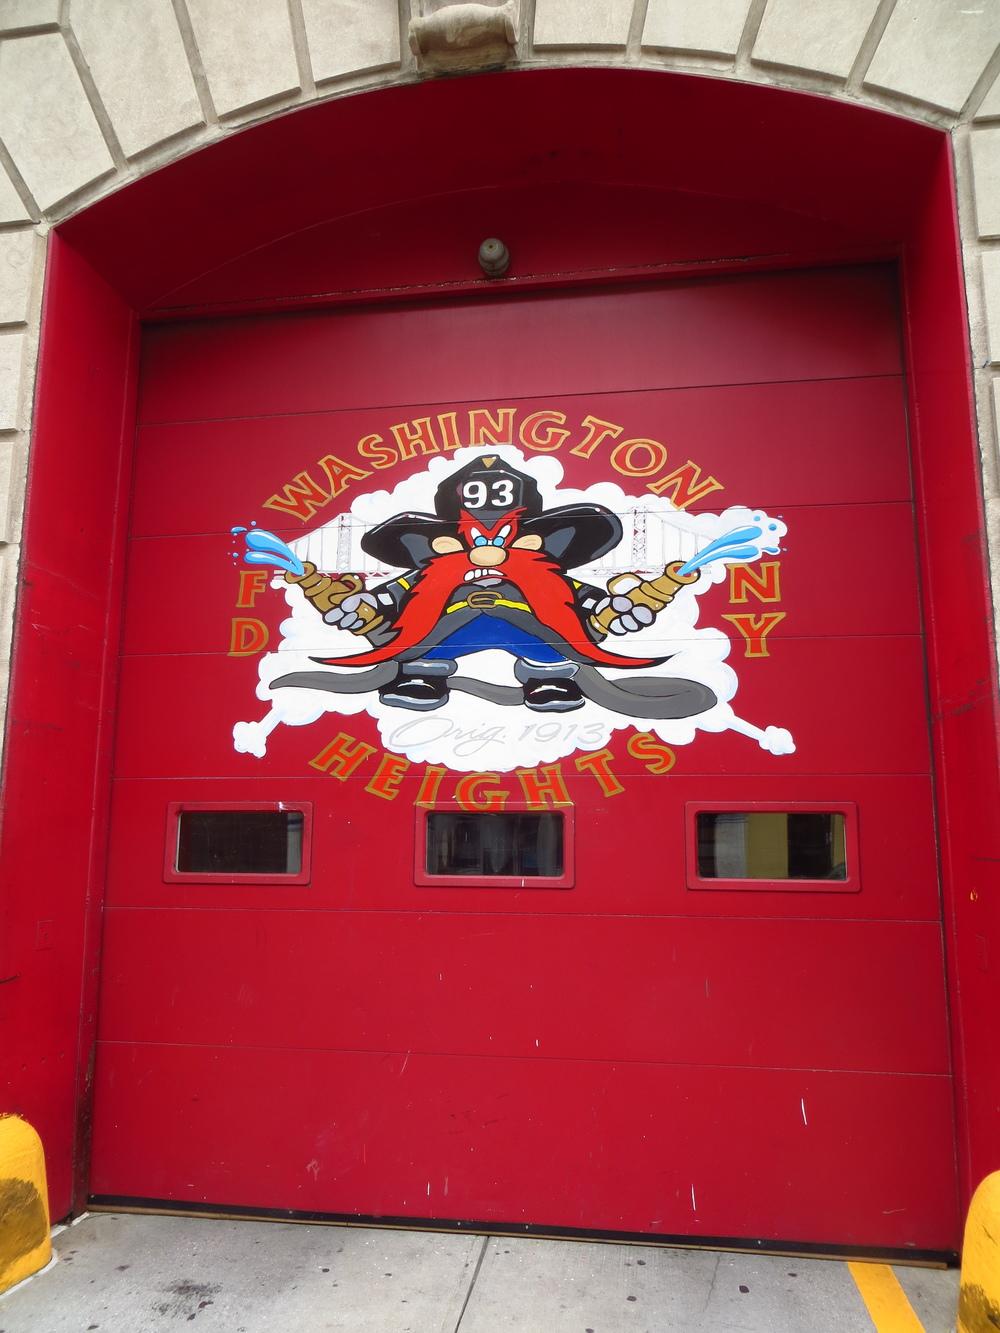 Fire station mascot